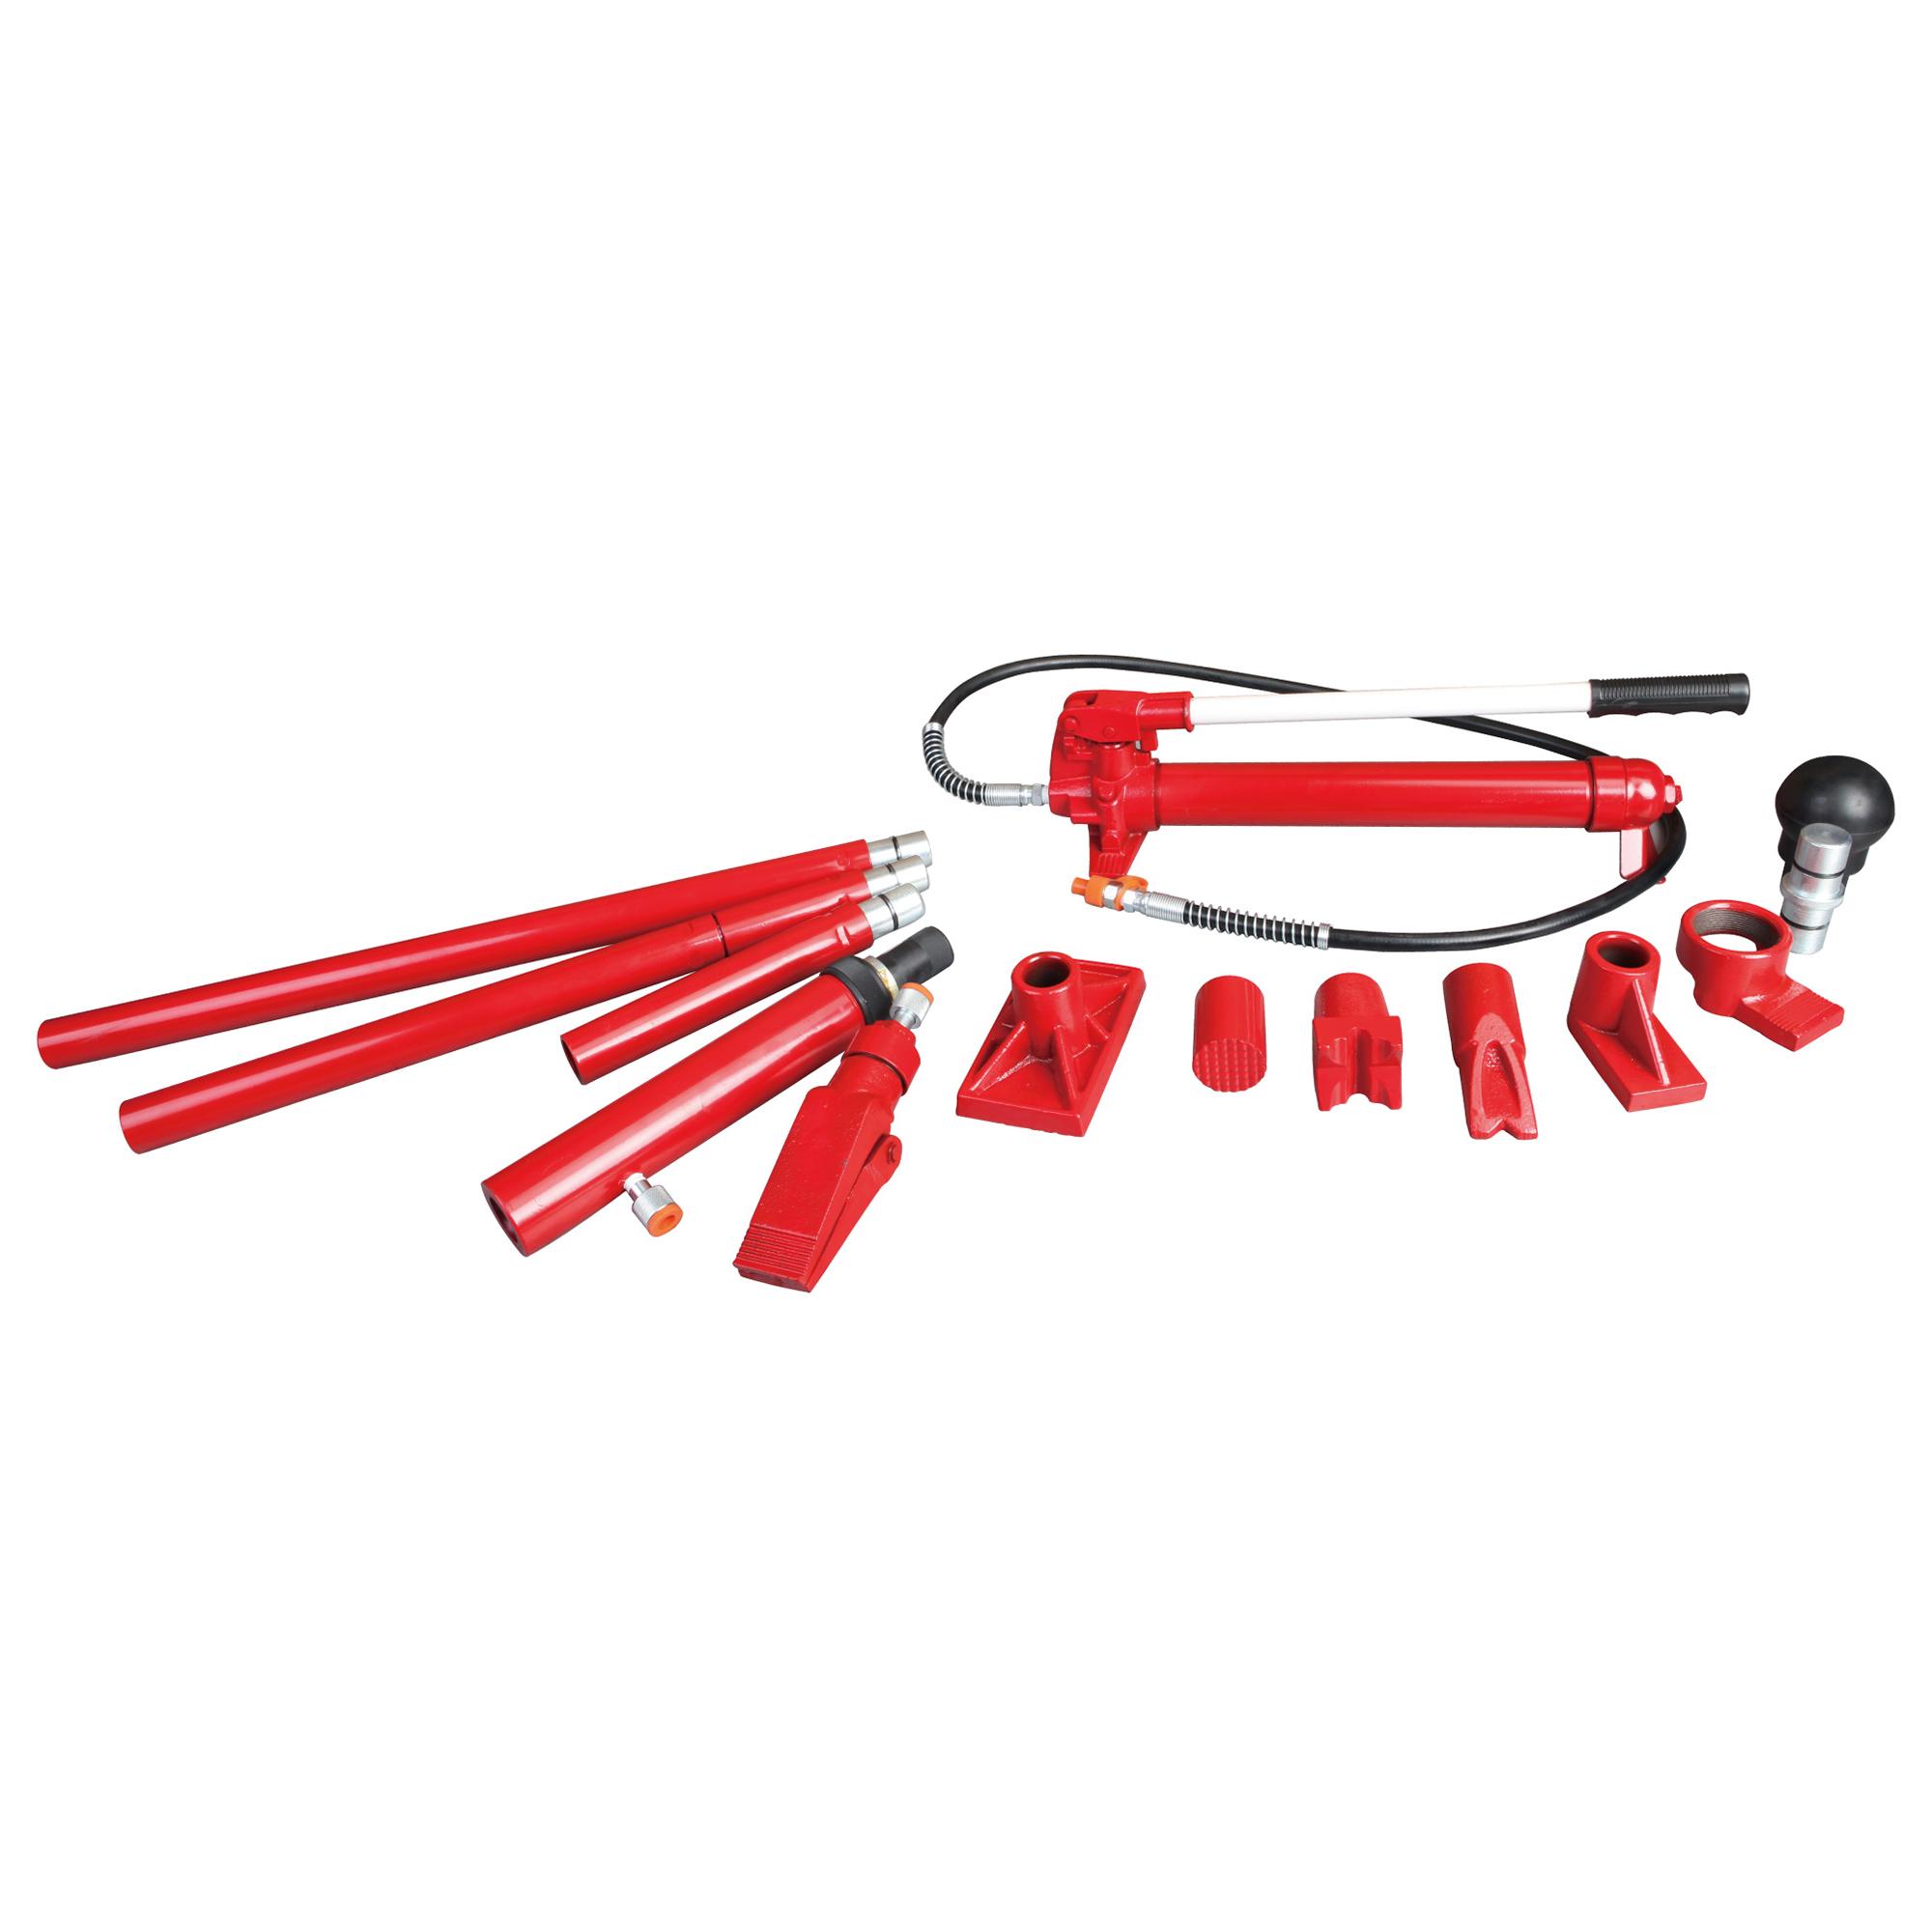 Torin Big Red Portable Hydraulic Ram: Auto Body Frame Repair Kit ...